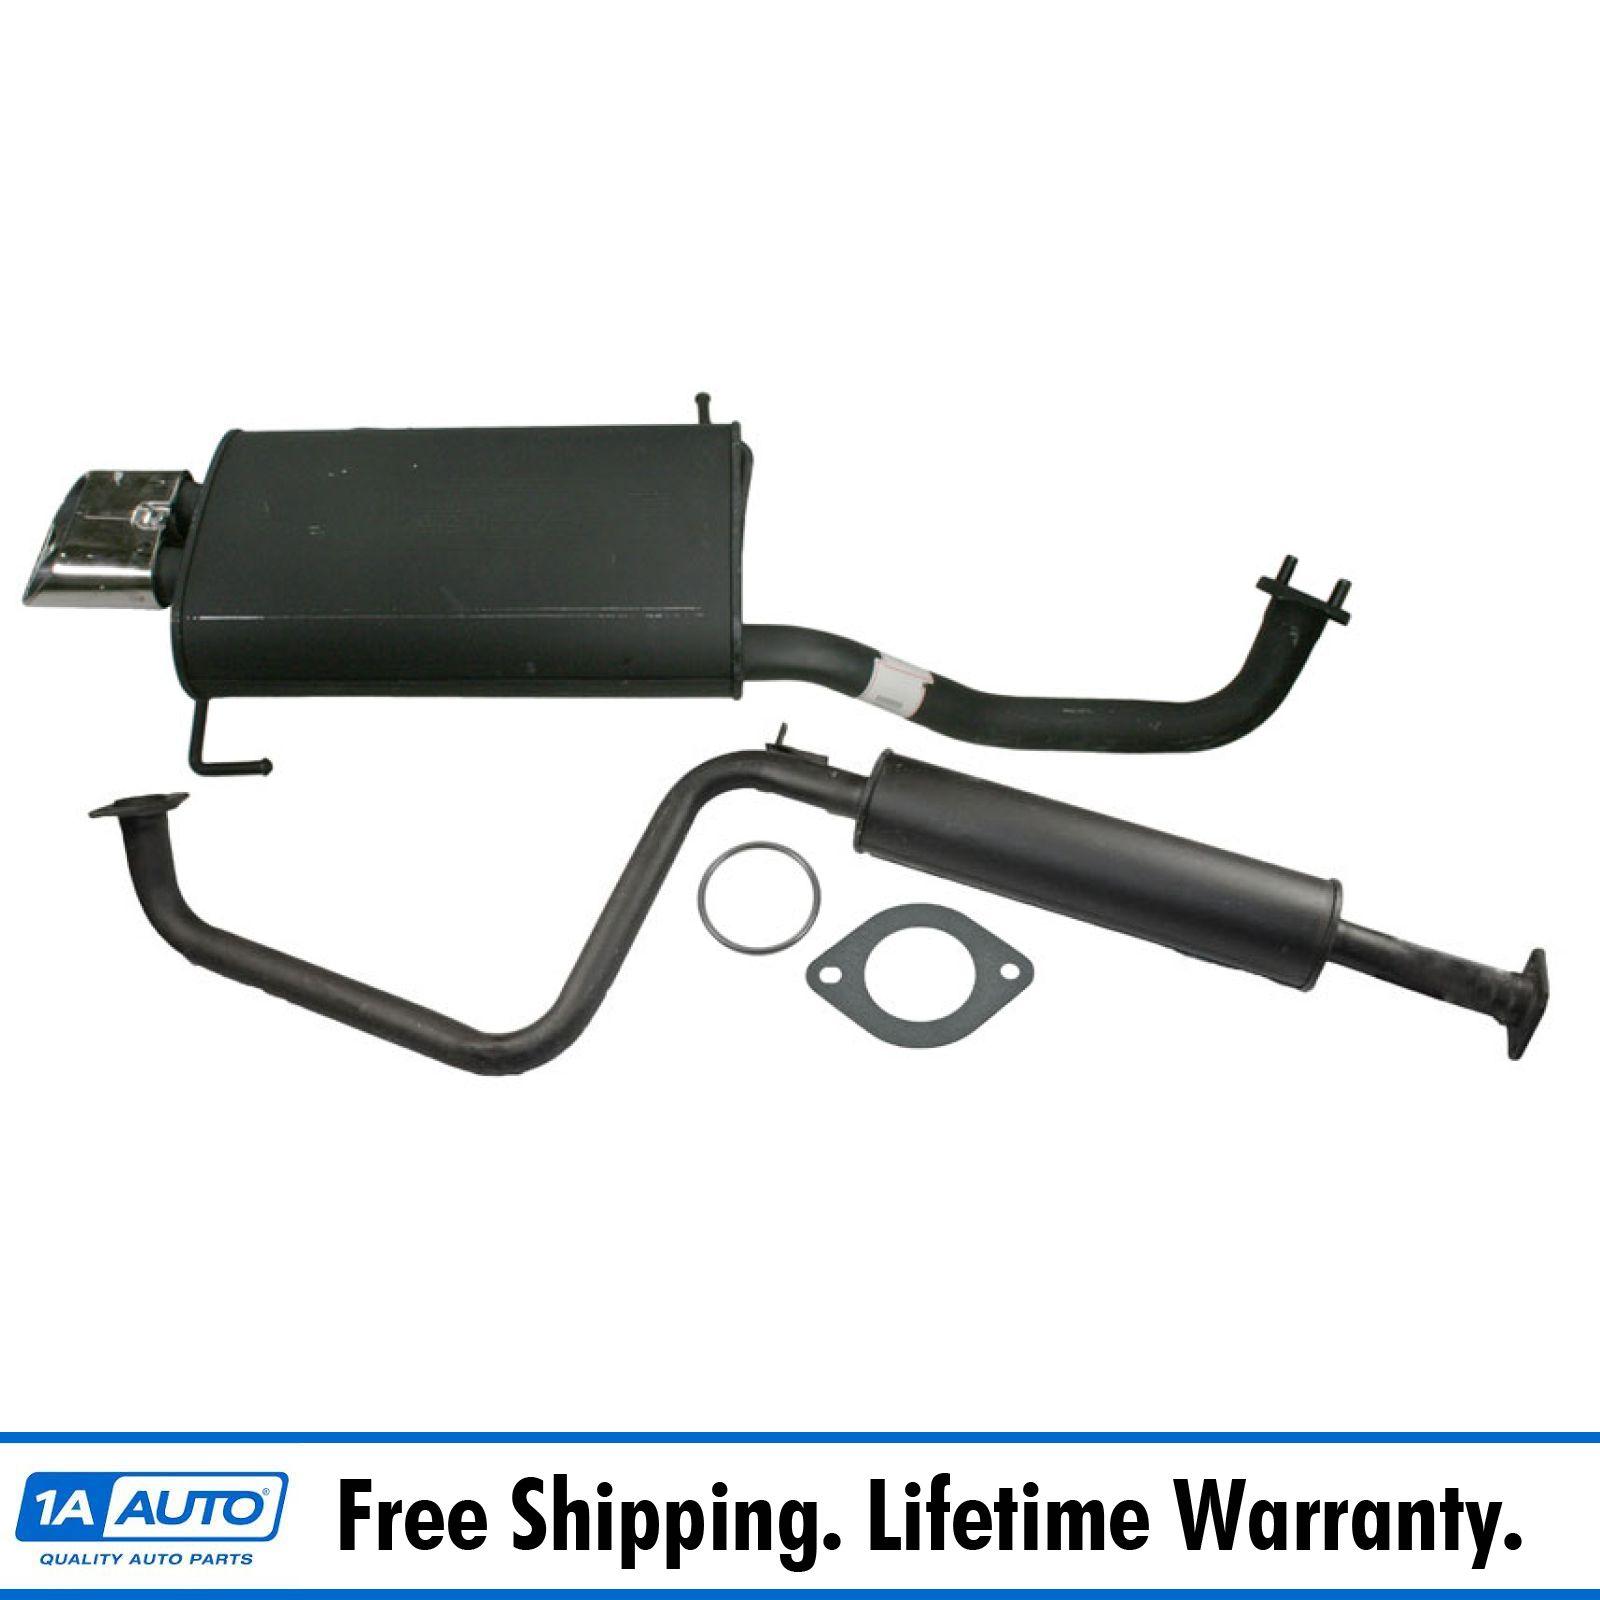 Intermediate Exhaust Pipe Resonator For 96-99 Infiniti I30 95-99 Nissan Maxima